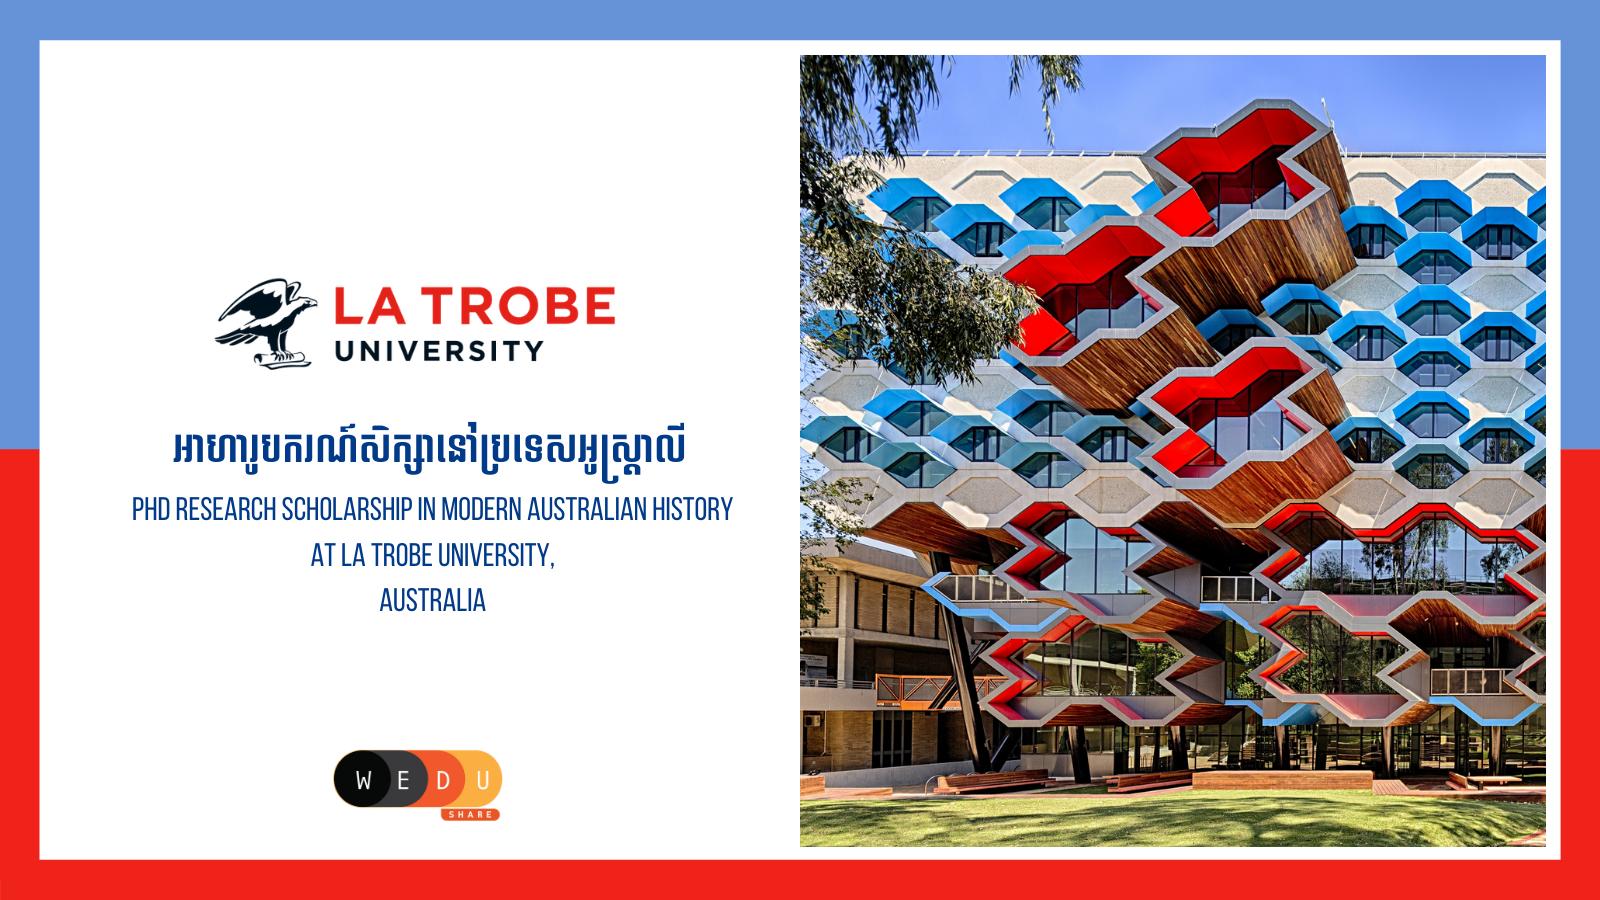 PhD Research Scholarship in Modern Australian History at La Trobe University, Australia